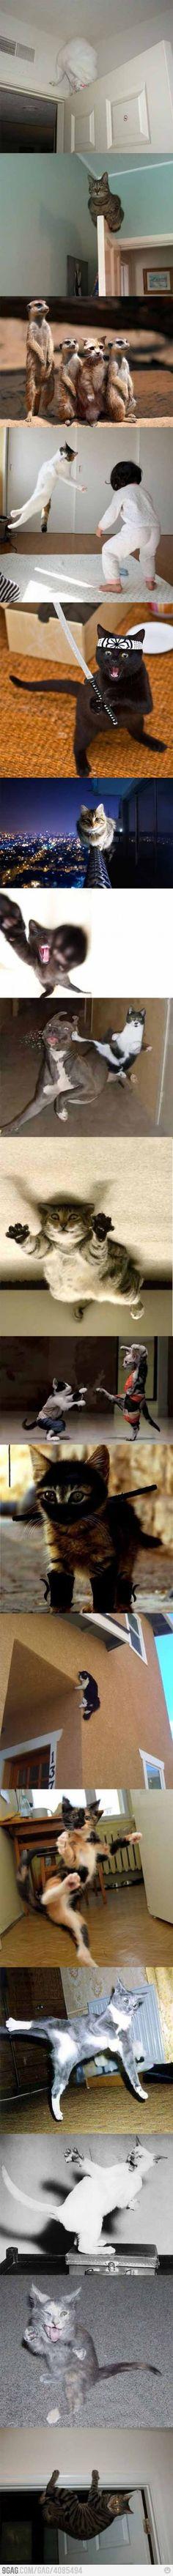 Ninja Cats compilation